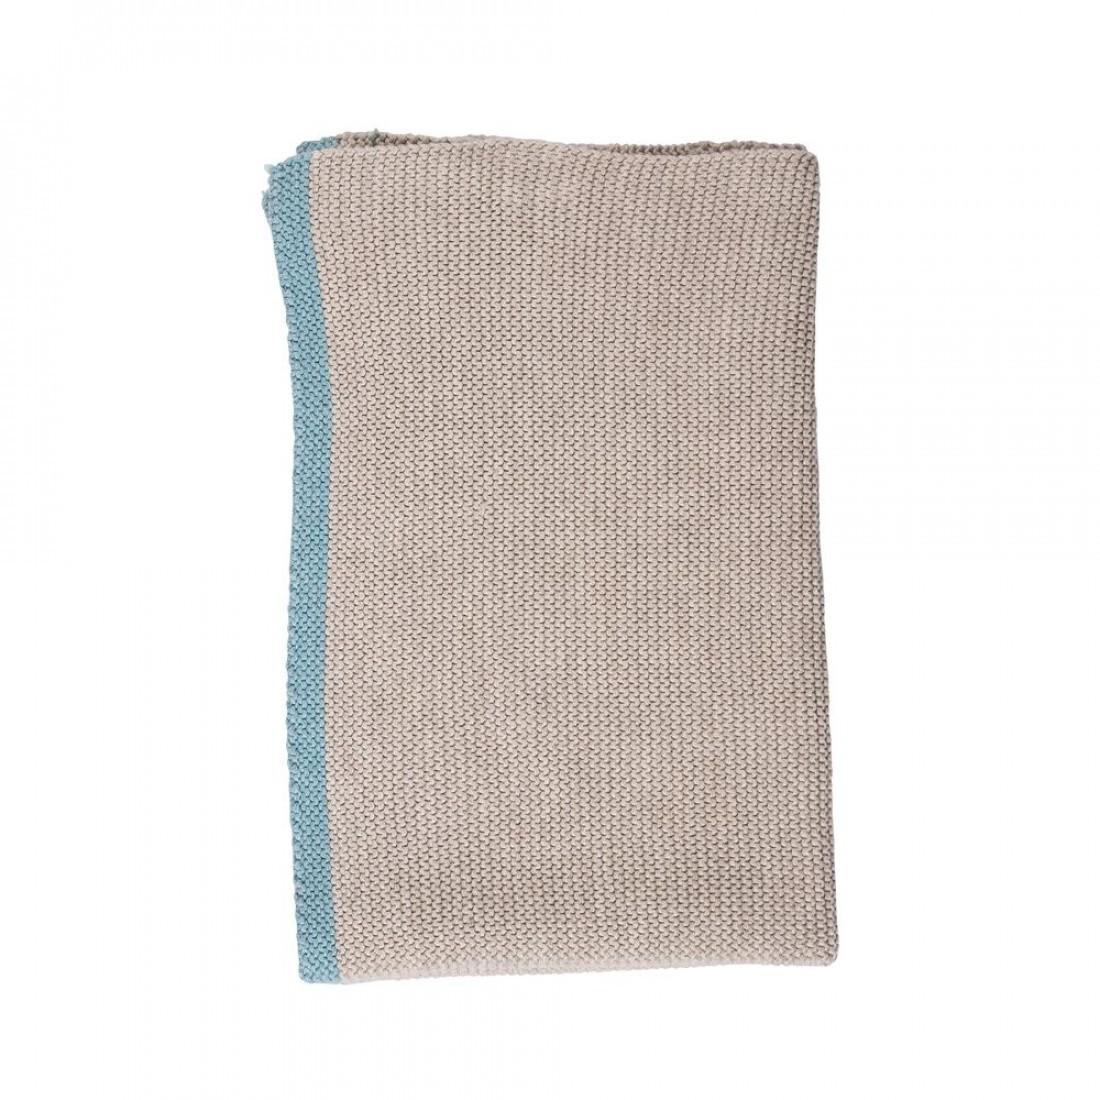 Broste keuken handdoek knit, donkergrijs turquoise